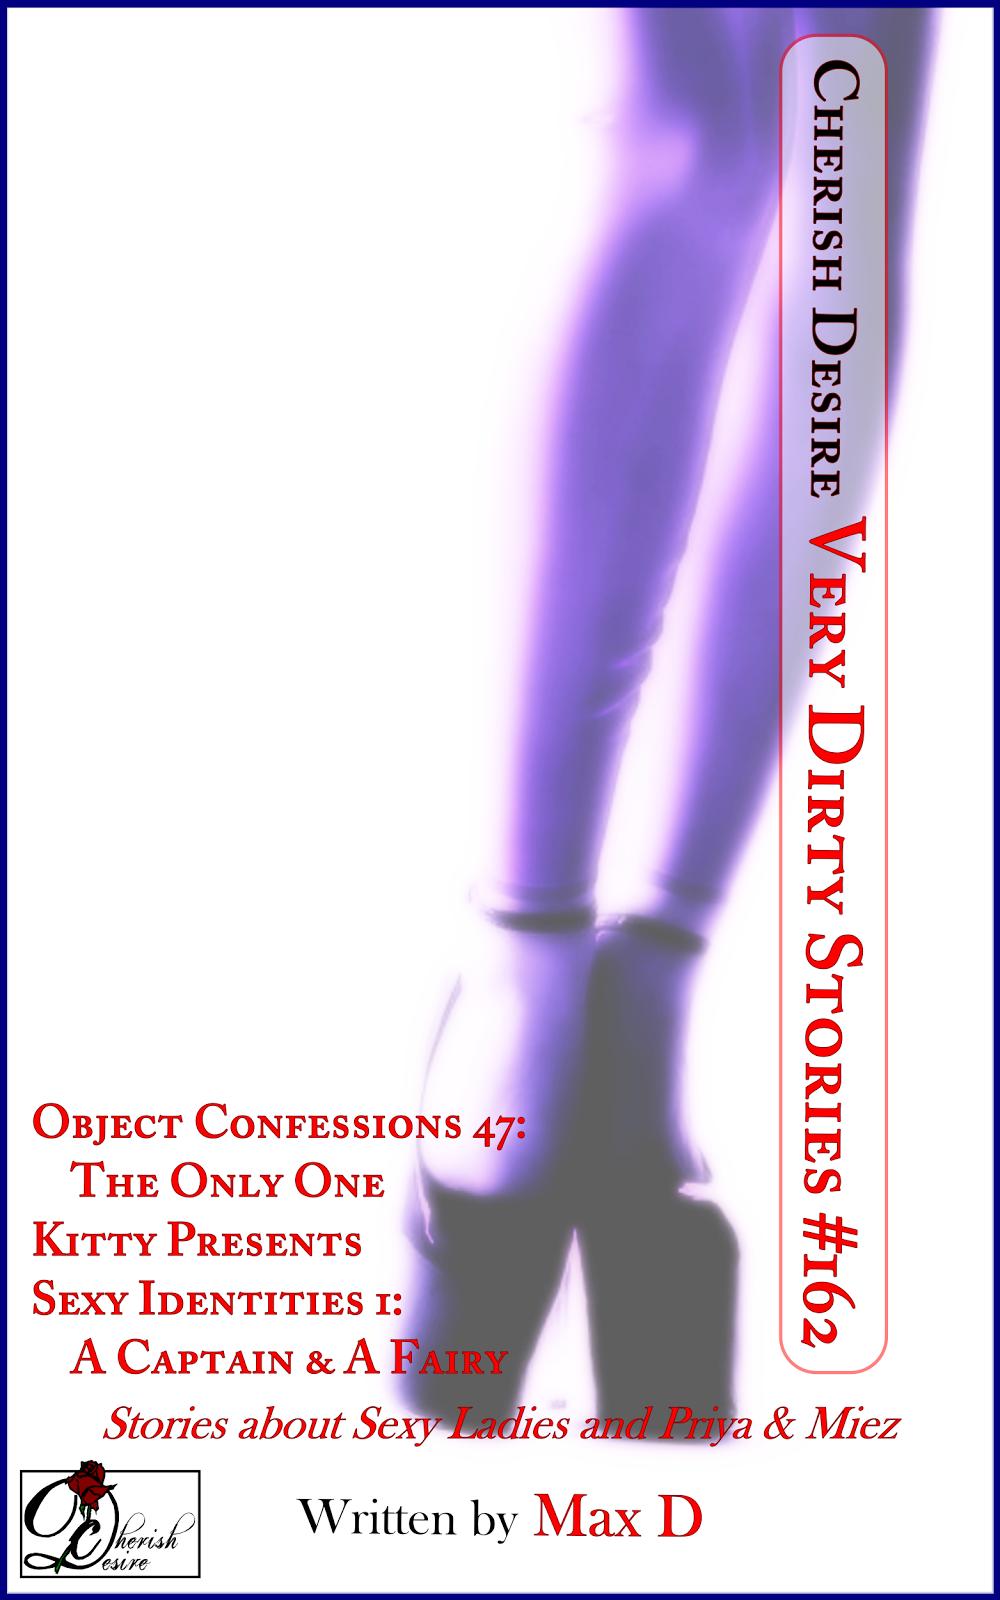 Cherish Desire: Very Dirty Stories #162, Max D, erotica